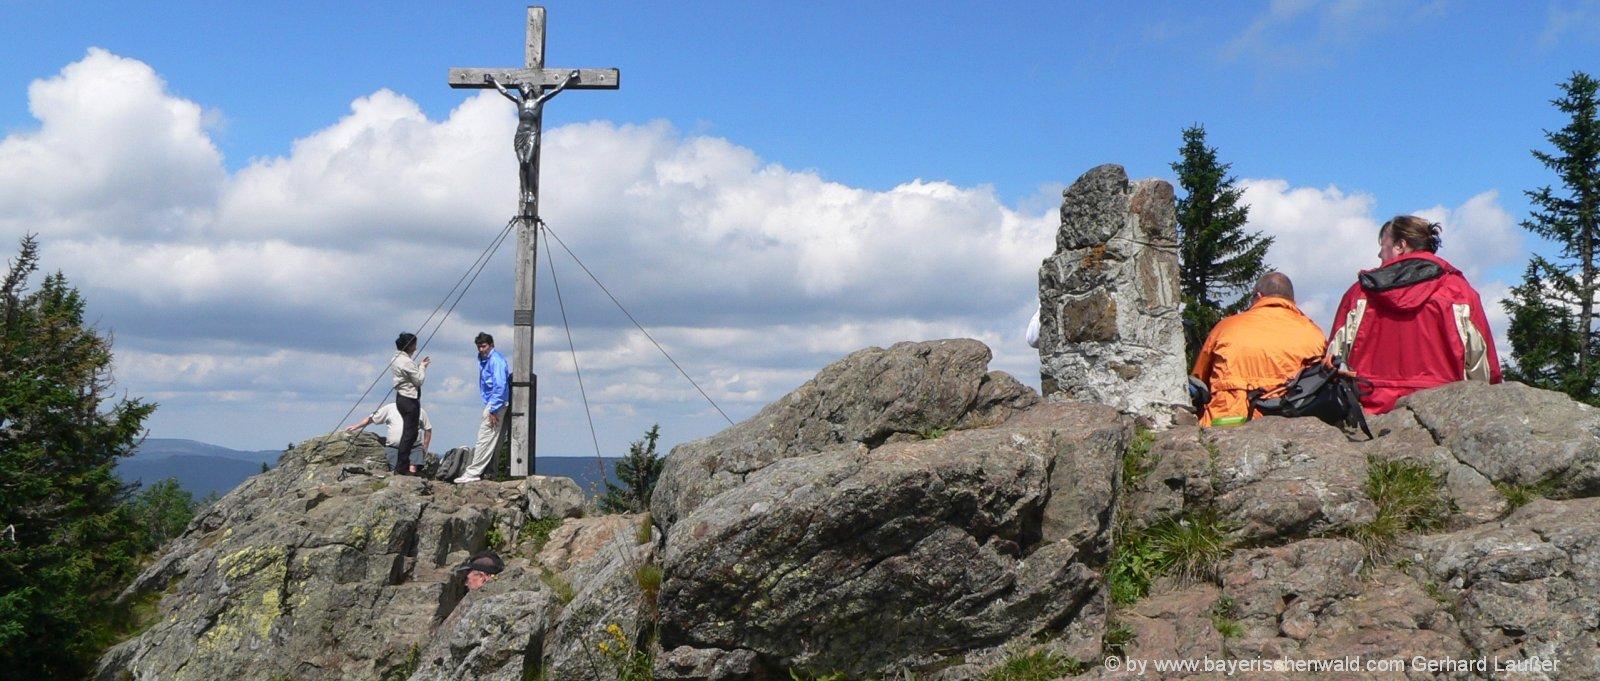 berg-bauernhof-bayern-bergwandern-rachel-nationalpark-bayerischer-wald